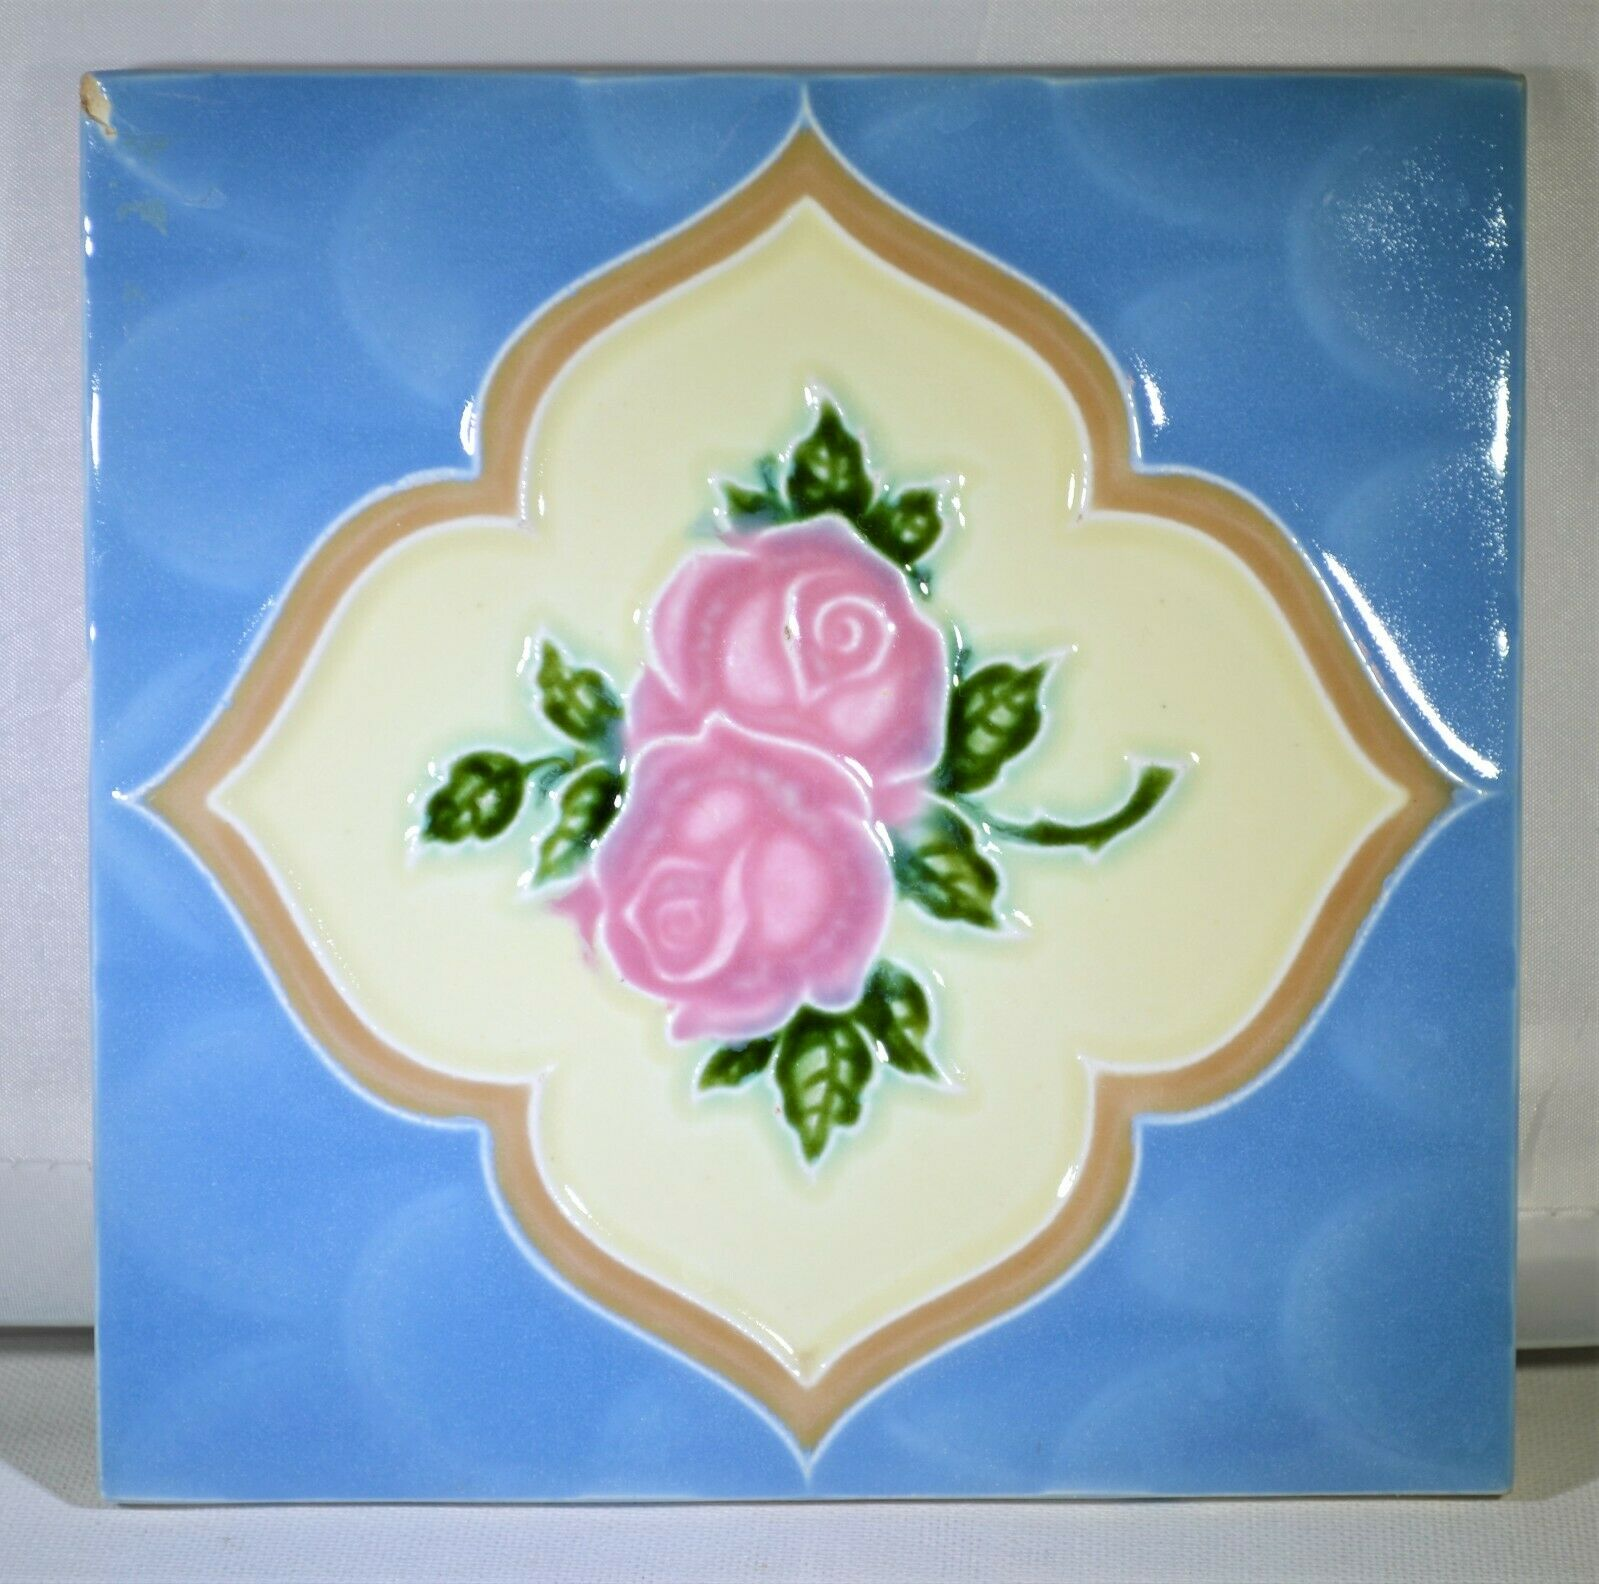 6 X 6 Embossed Rose Decorative Ceramic Tile Trivet Wall Art Made In England - $8.76